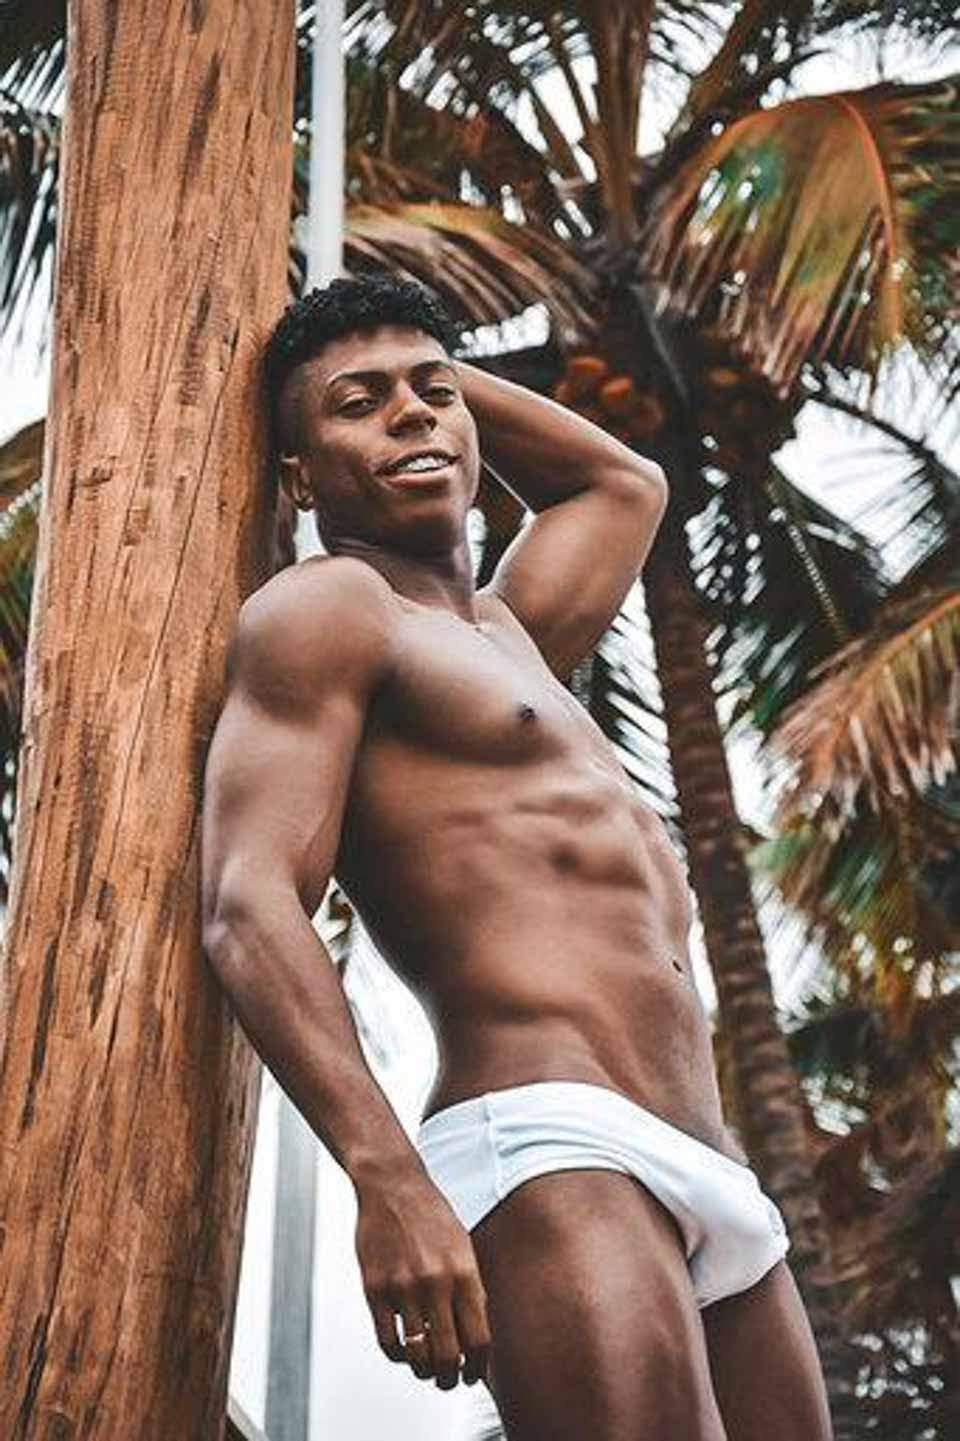 Mister Model Nacional Rio de Janeiro 2019 - Jorge Lopes. Foto: Yuri Rodeoli